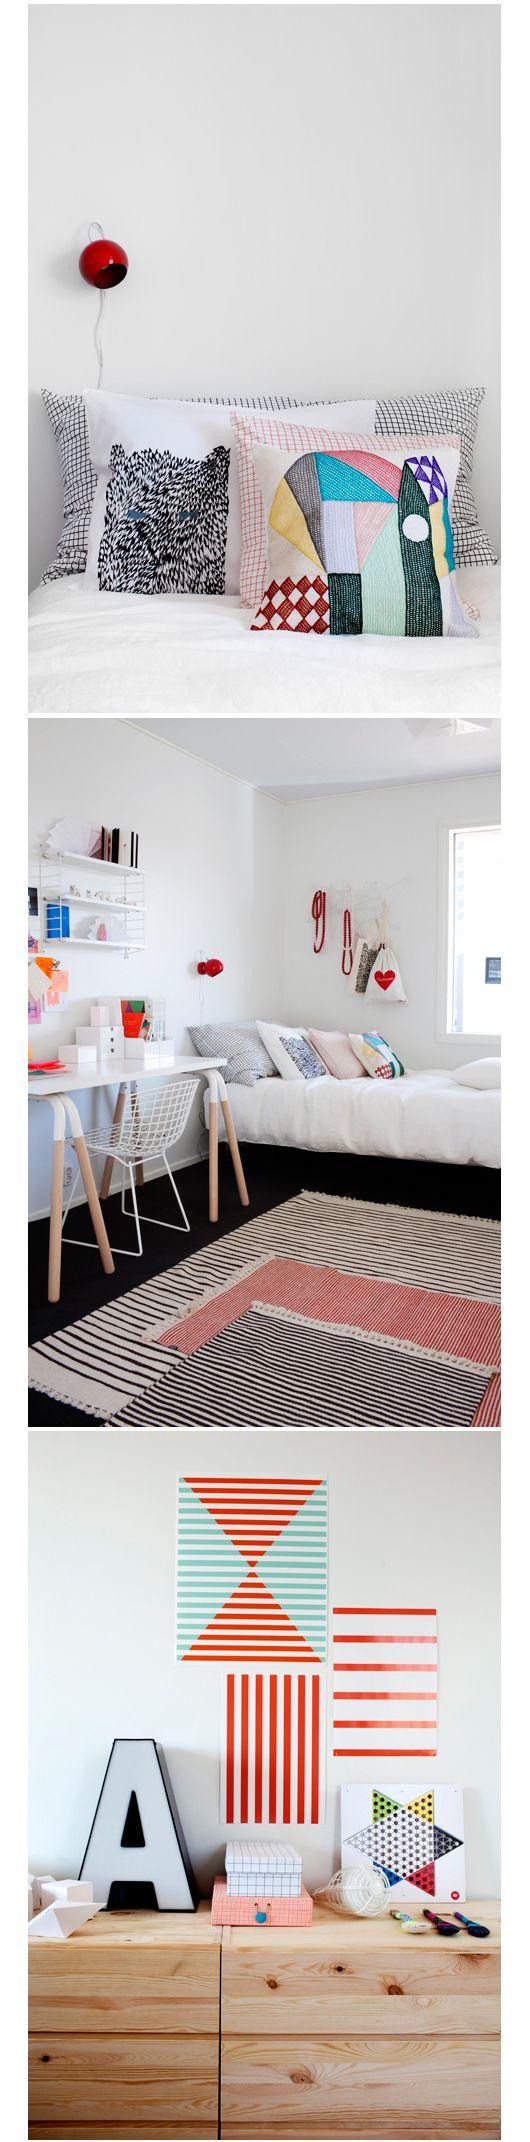 love getting inspiration from children's rooms.. http://artisandurgence.com/plombier/plombier-paris/plombier-paris-2/